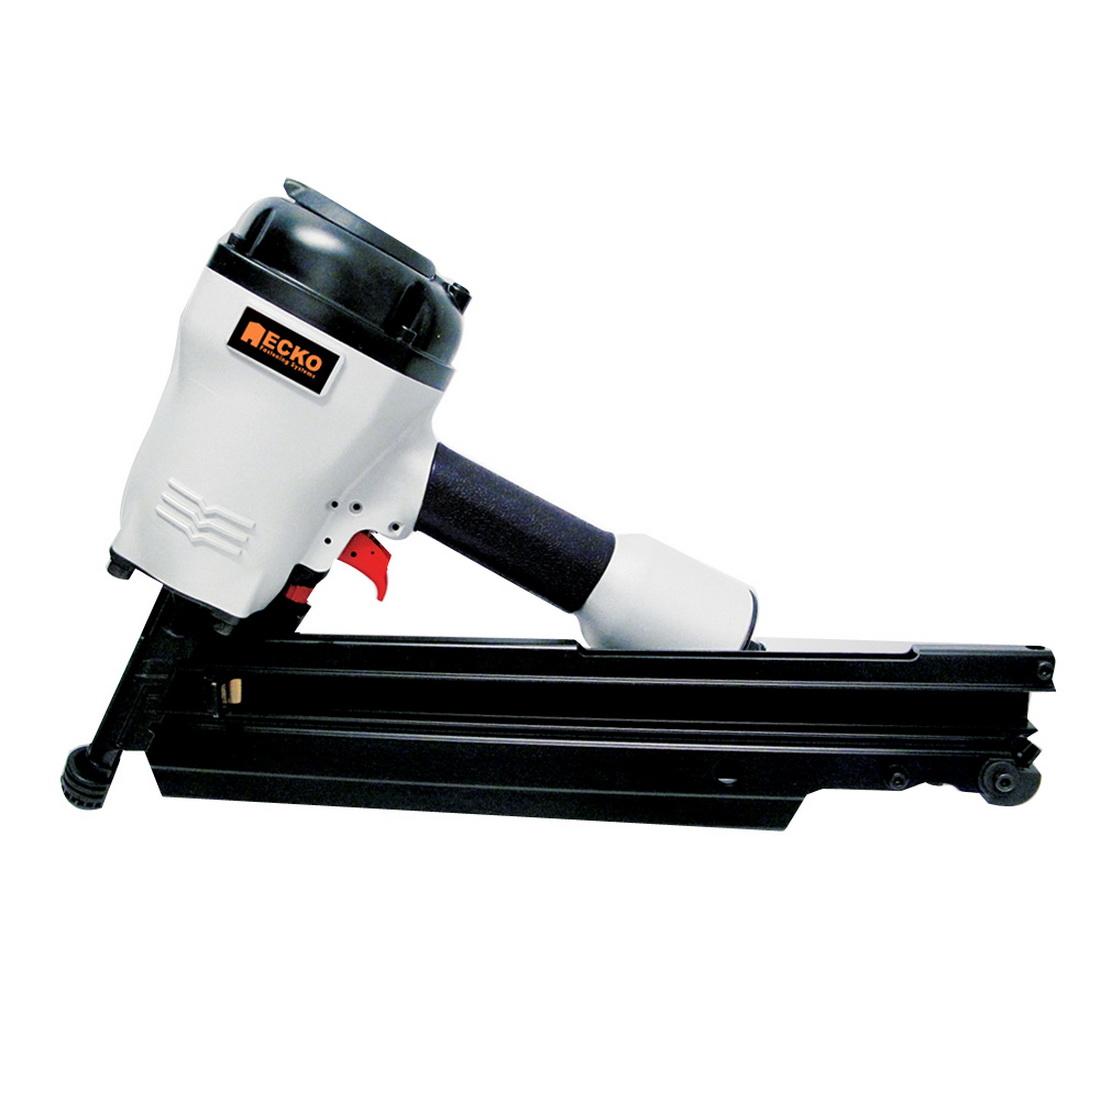 Frametec90 Construction Air Framer 50-90mm Magnesium ND90S